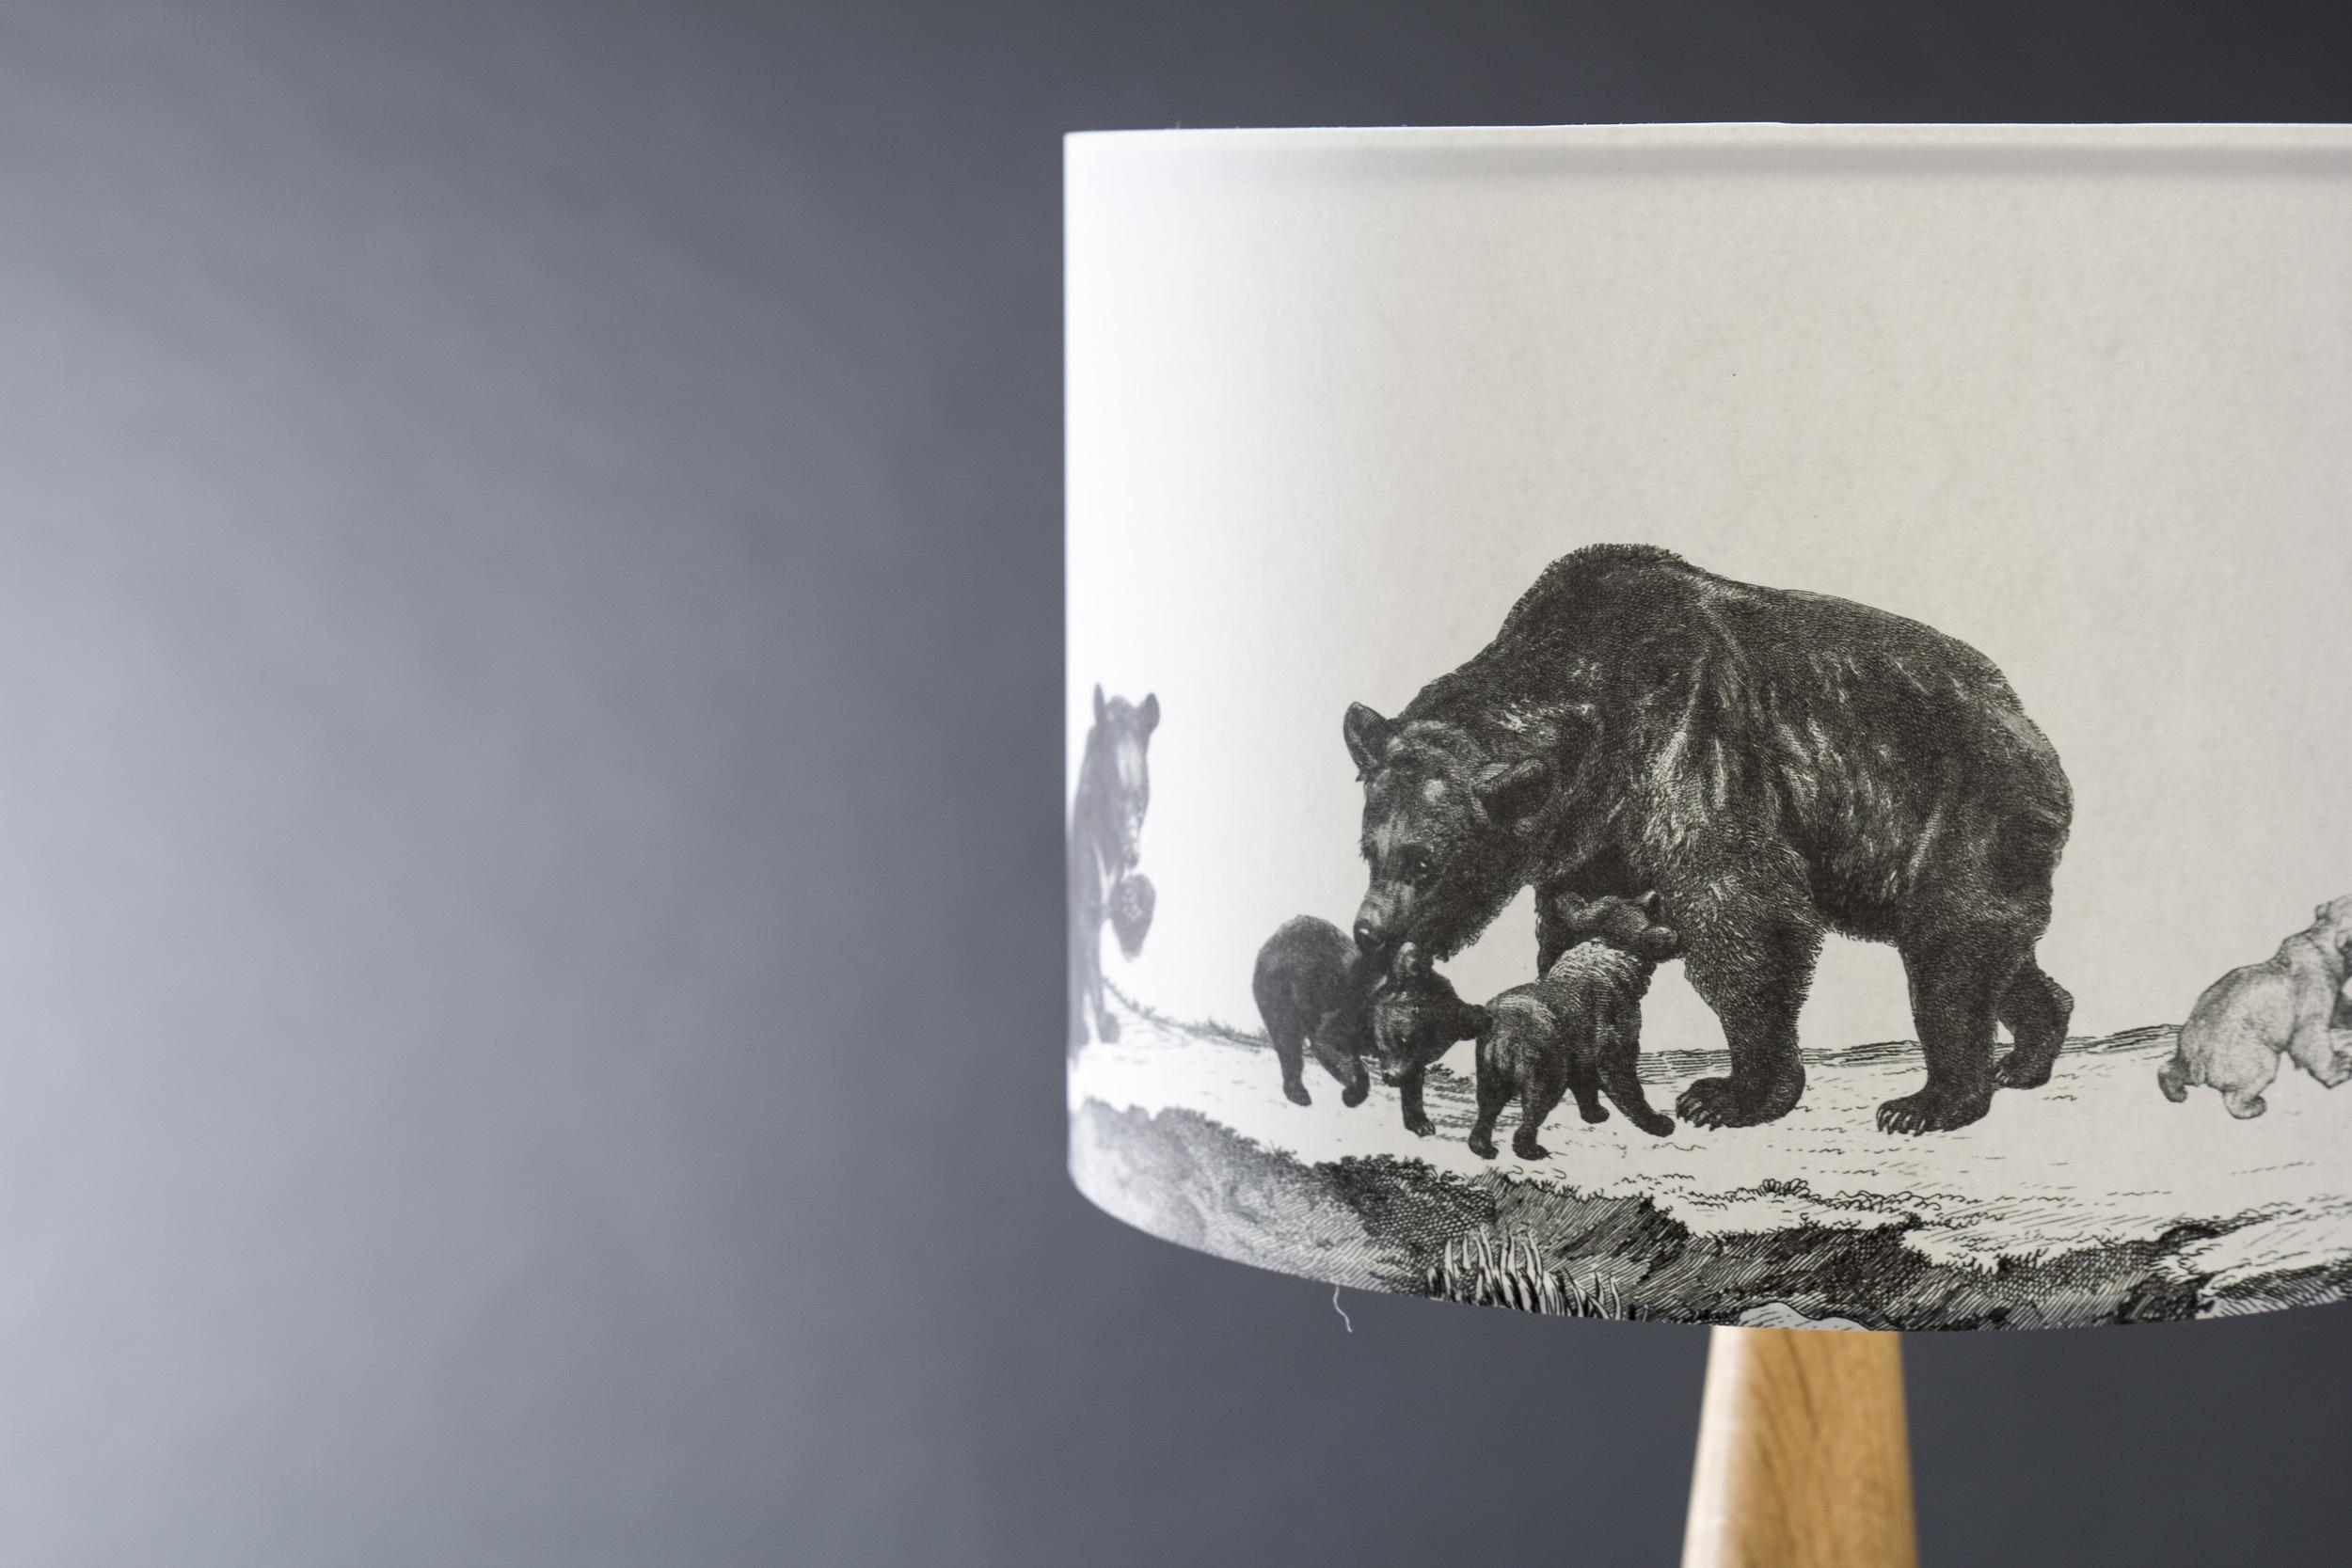 Mountain & Molehill - Bears Lamp 300dpi - Detail 2.jpg